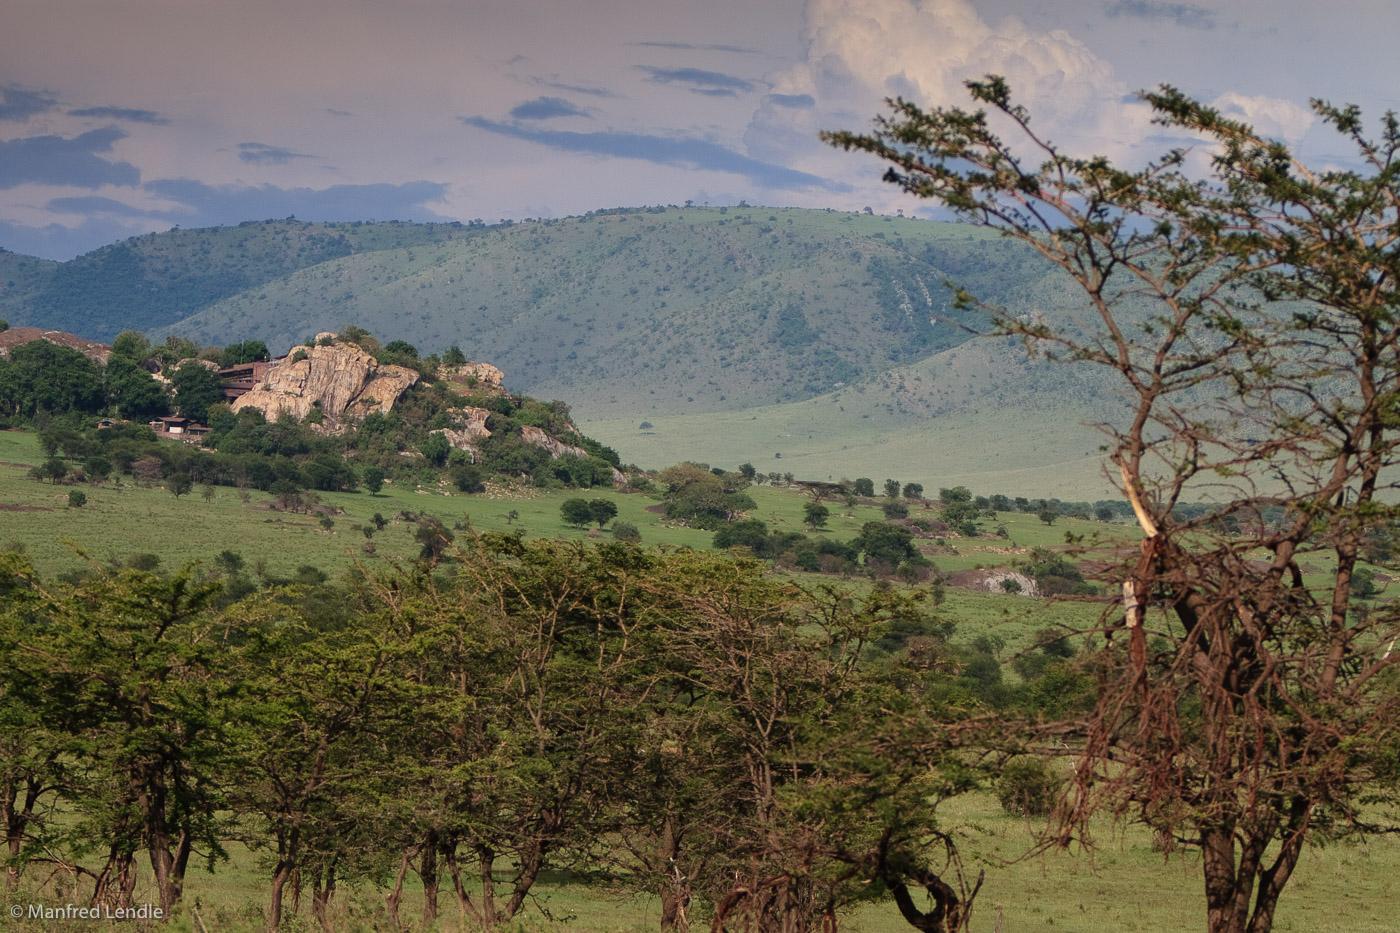 Tansania_2009-6970.jpg